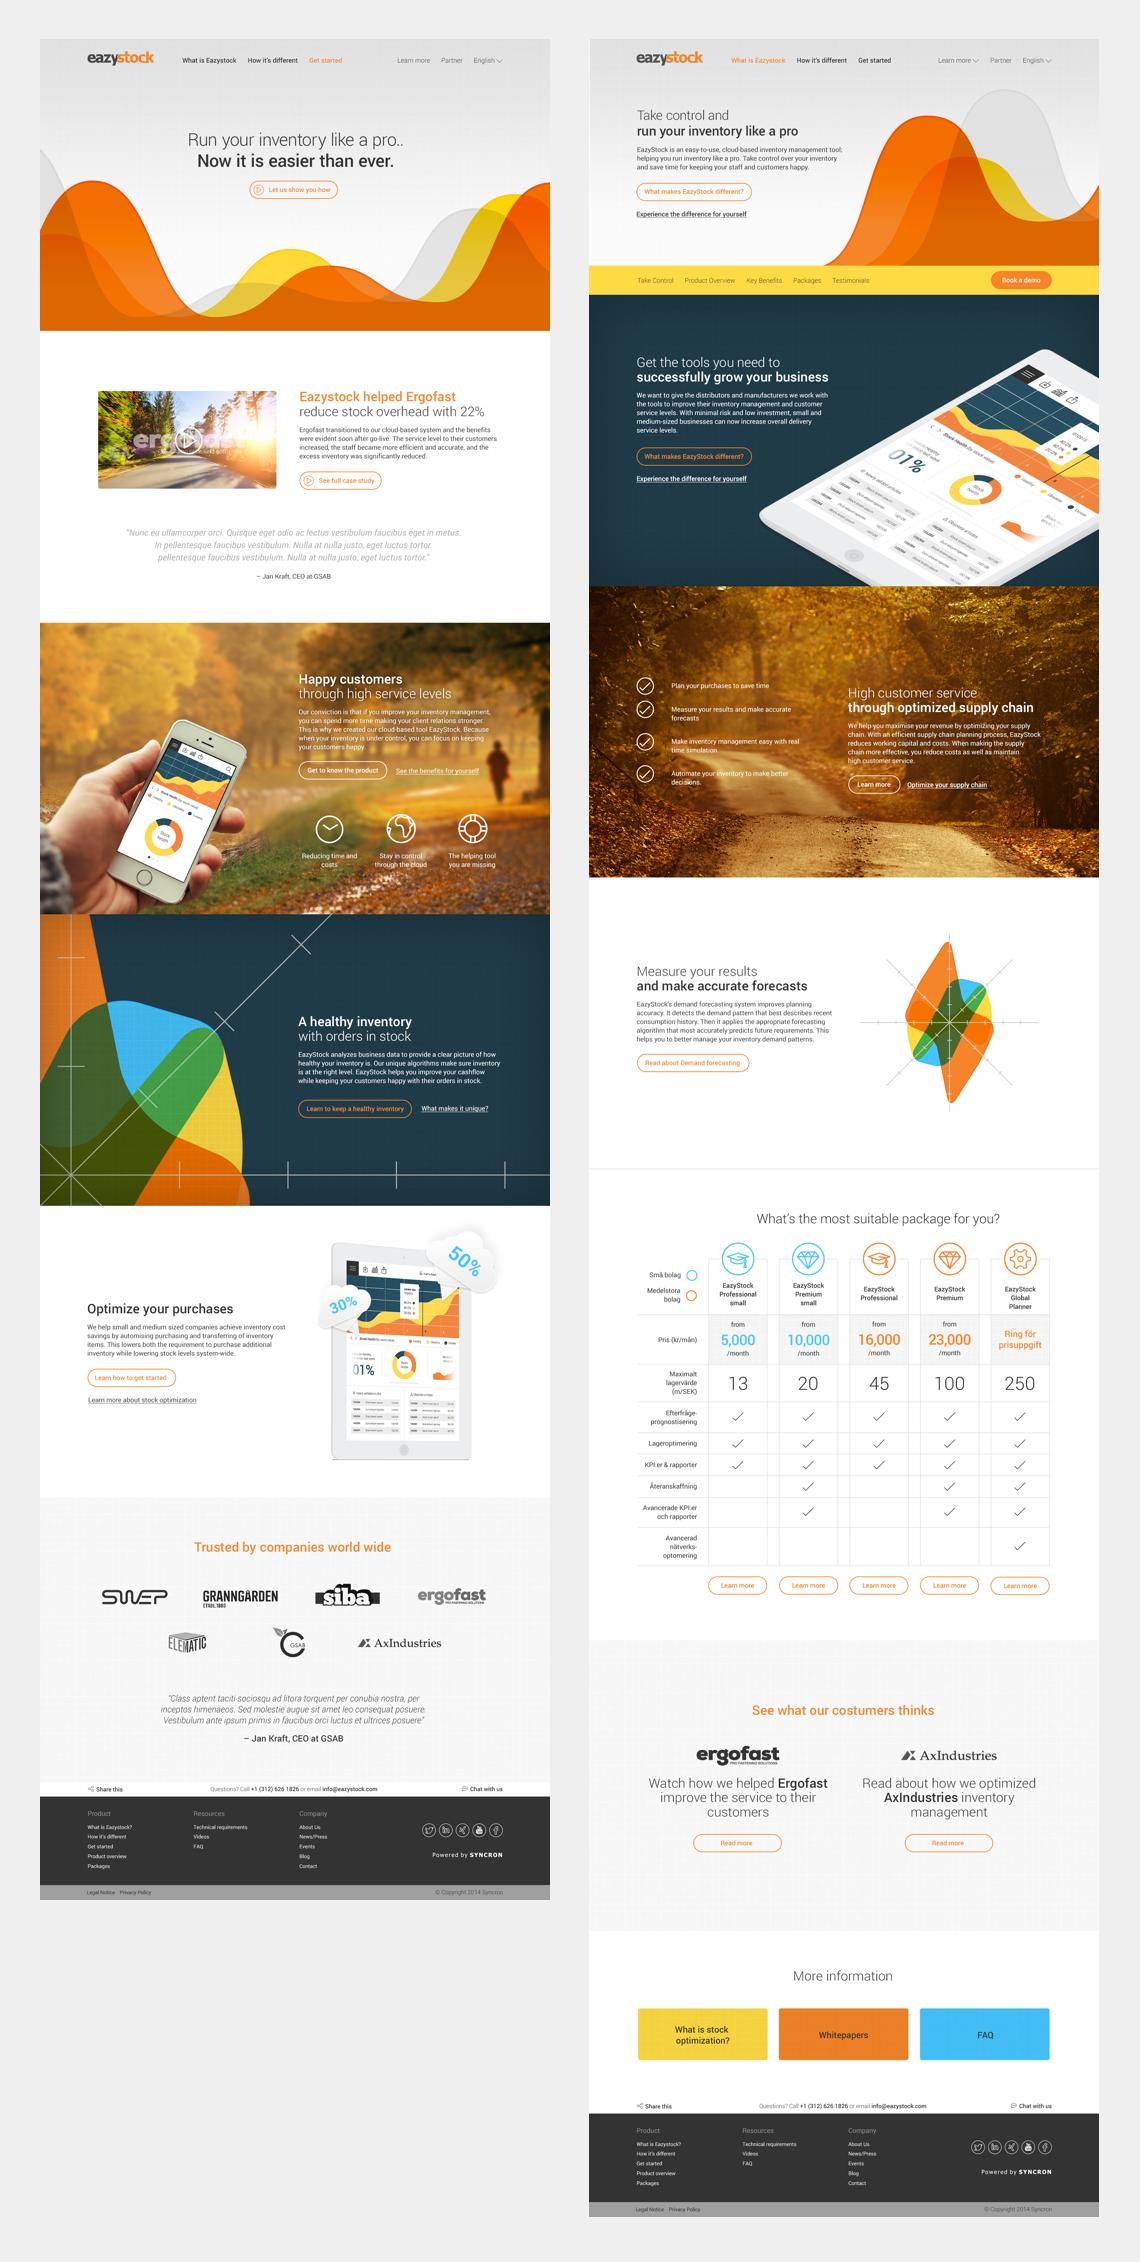 eazystock_web 8